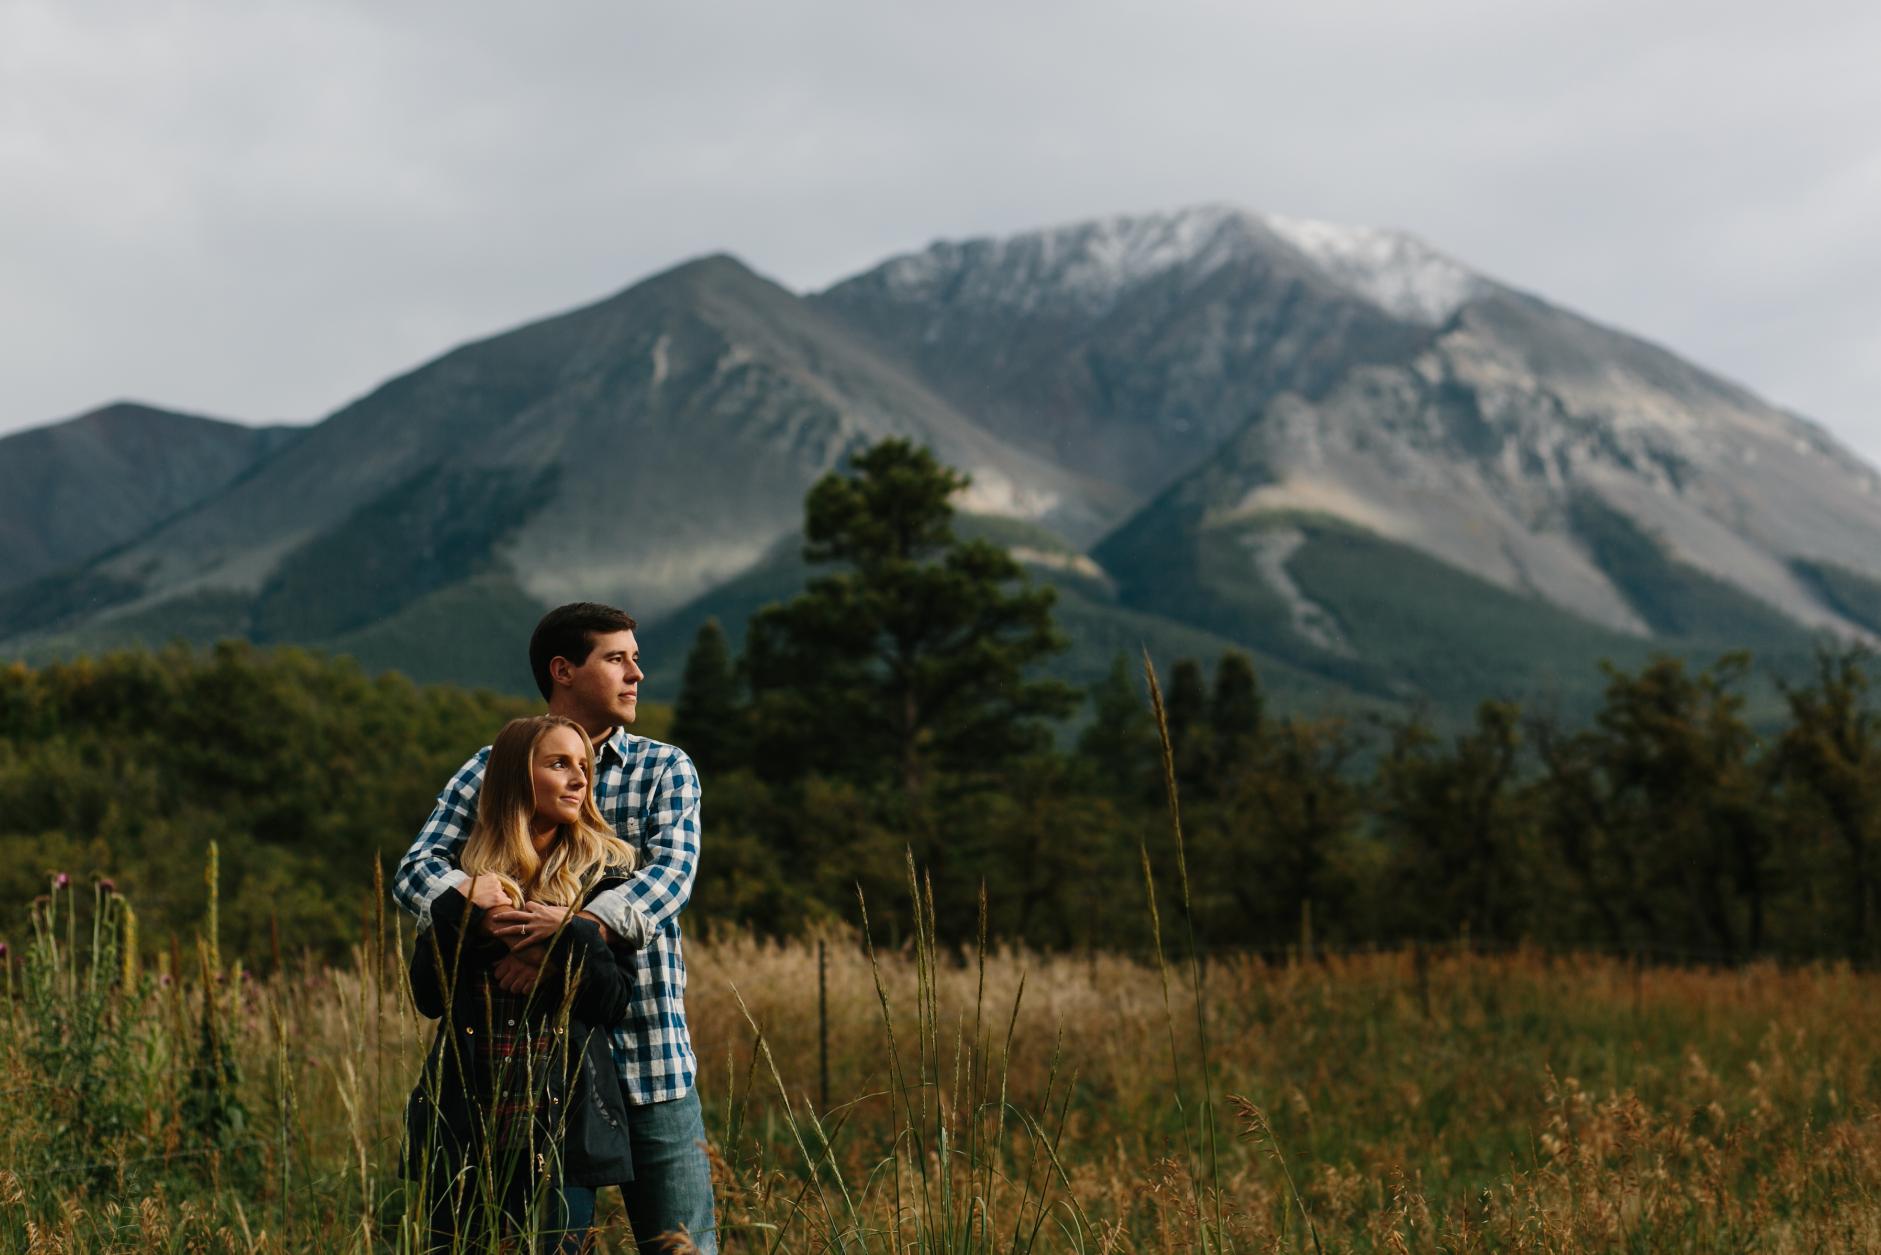 destination adventure engagement session in Colorado